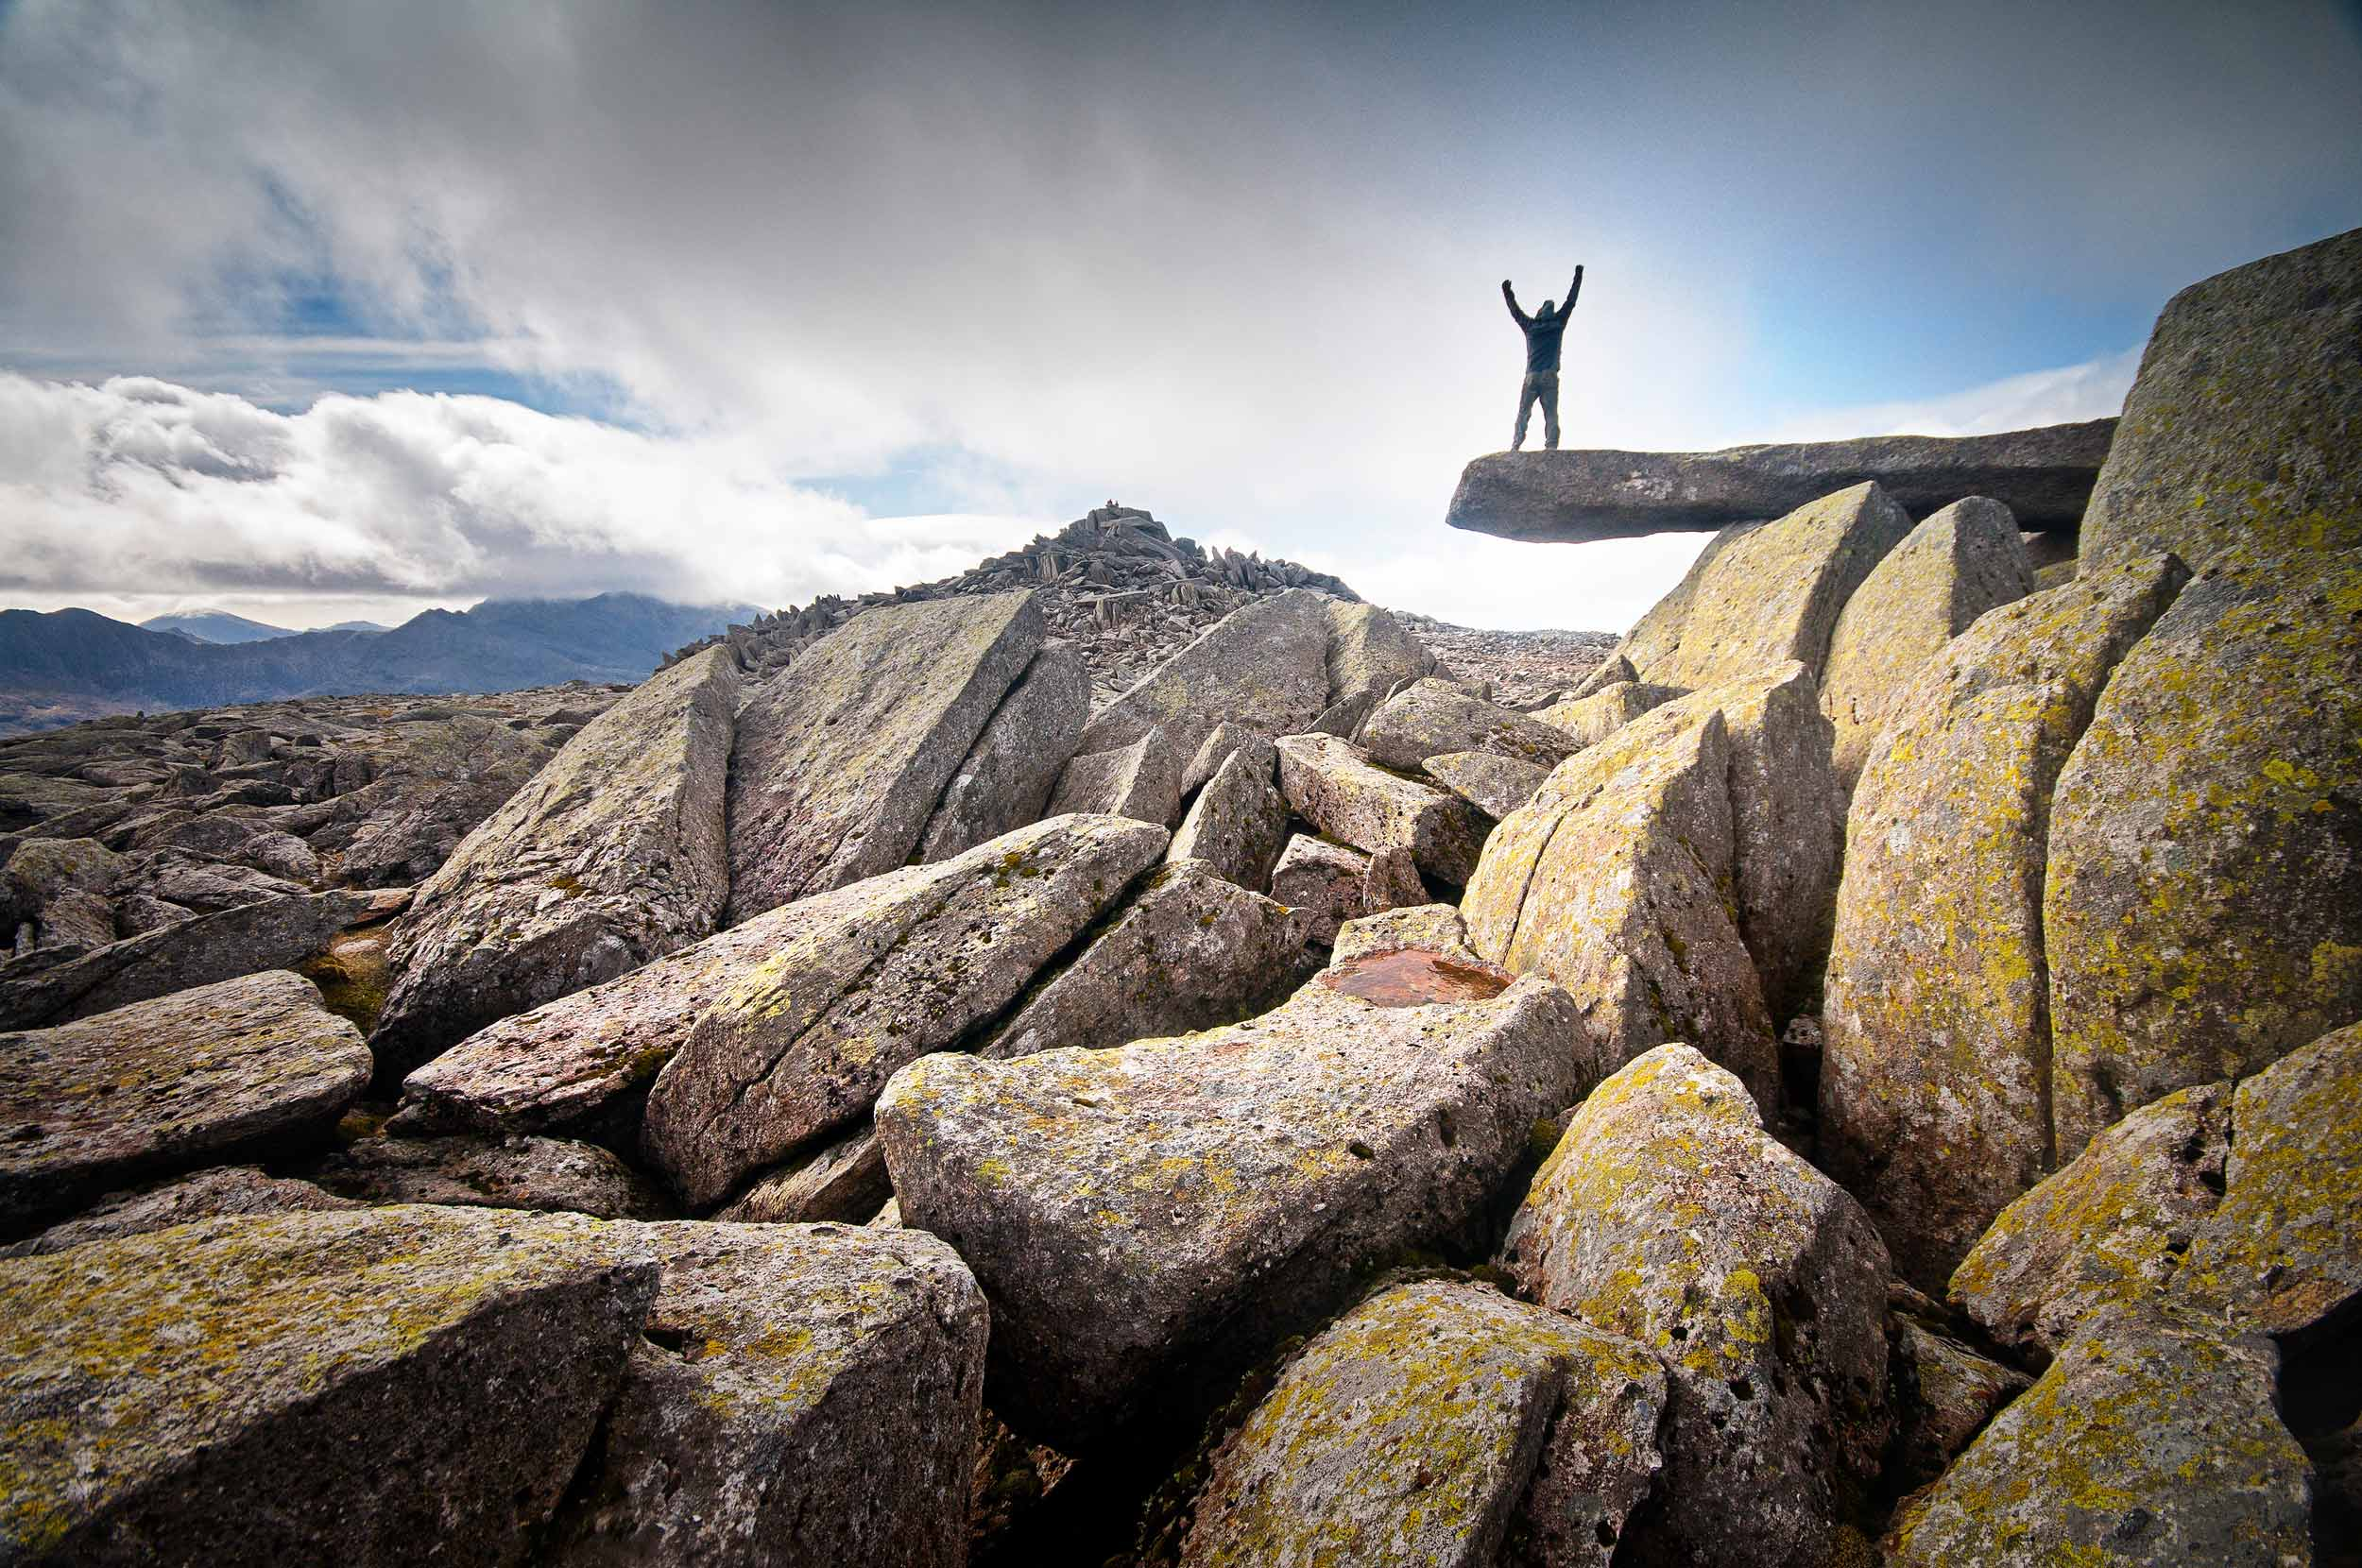 Cantilever Rock, Glyder Fach, Snowdonia  (Crown copyright 2018 / Visit Wales)